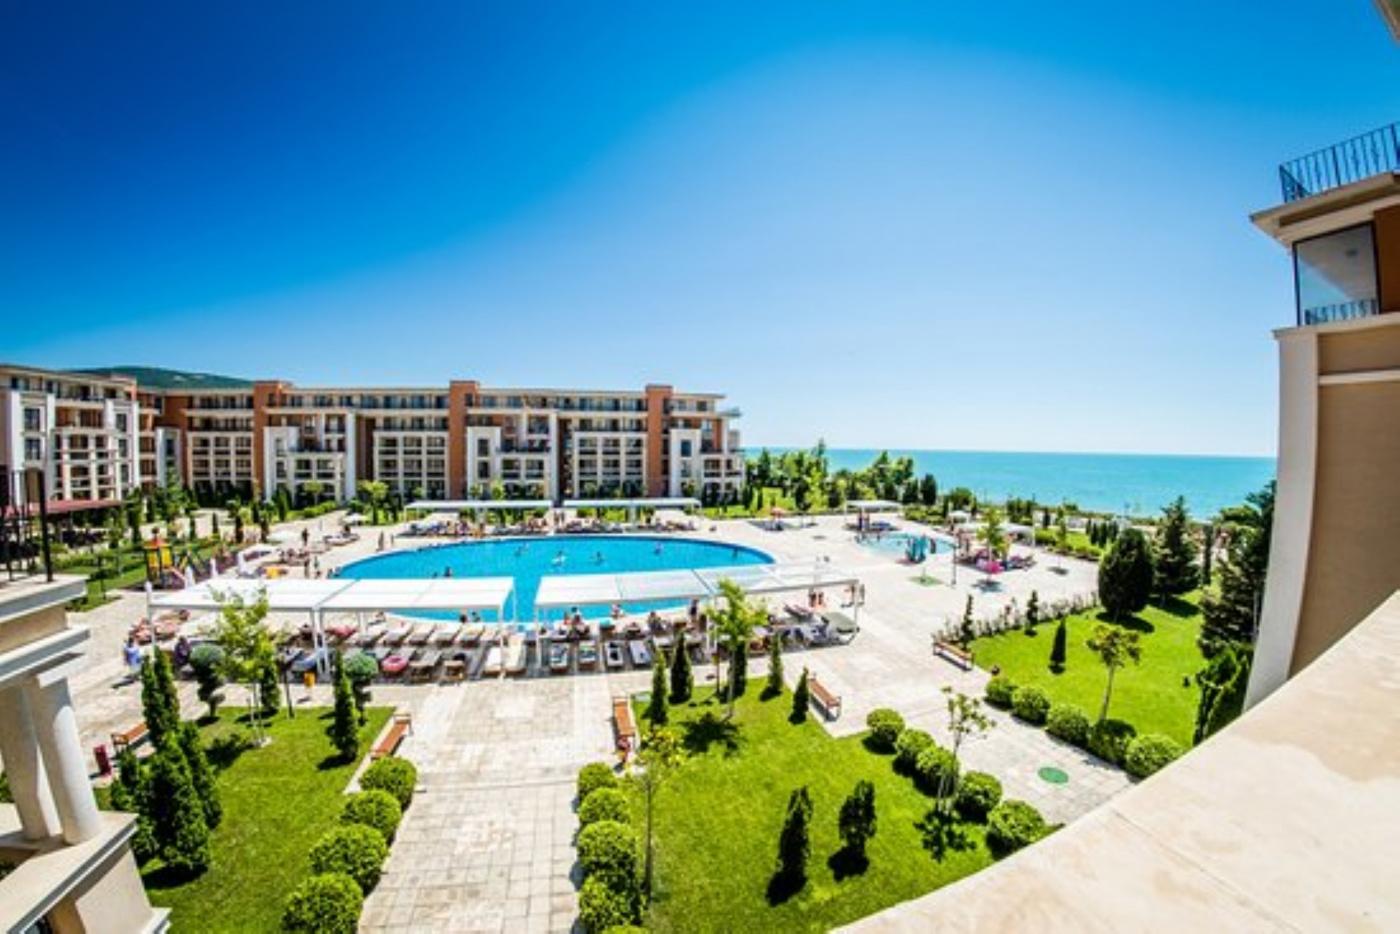 Prestige Fort Beach Апарт-отель